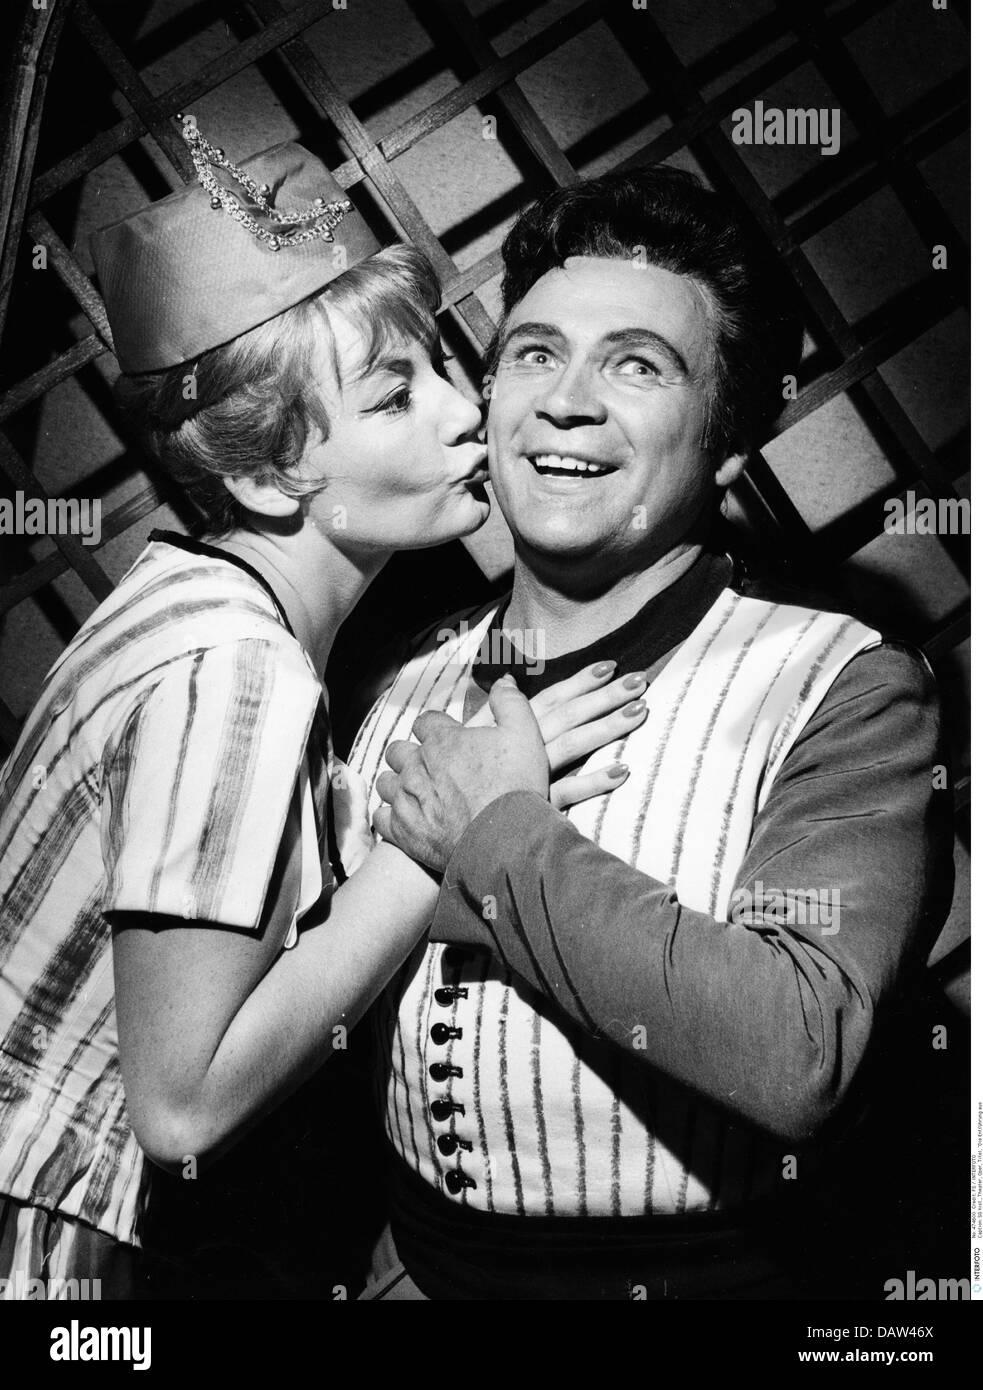 theatre, opera, 'The Abduction from the Seraglio', production: Karlheinz Haberland, Salzburg, 1963, scene - Stock Image